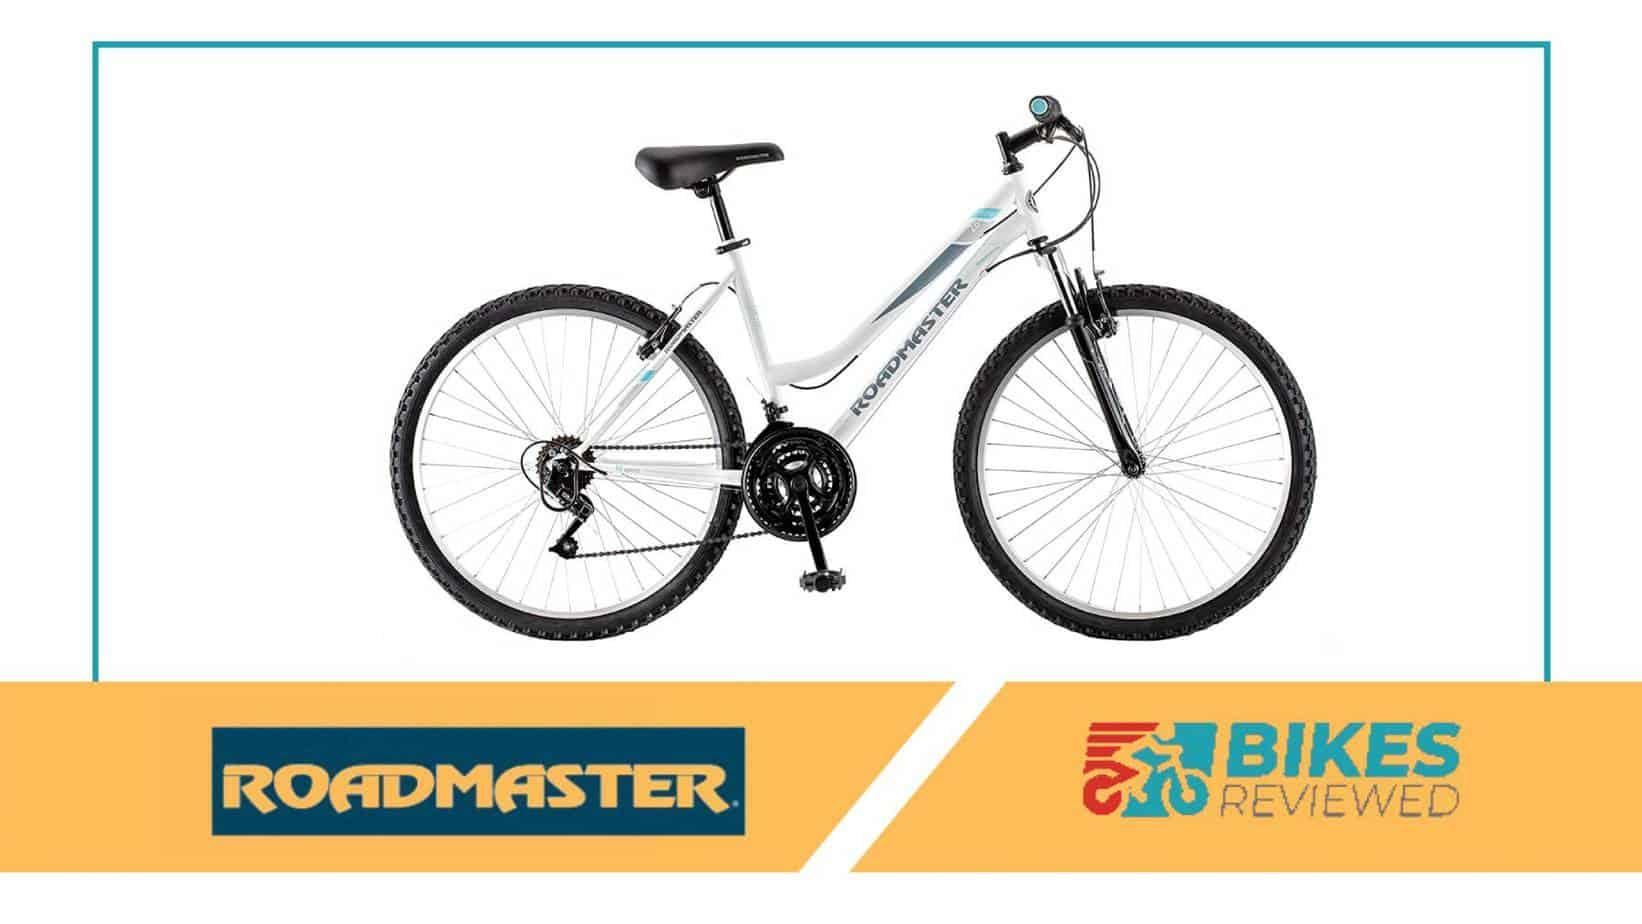 Road master Mountain bike brand